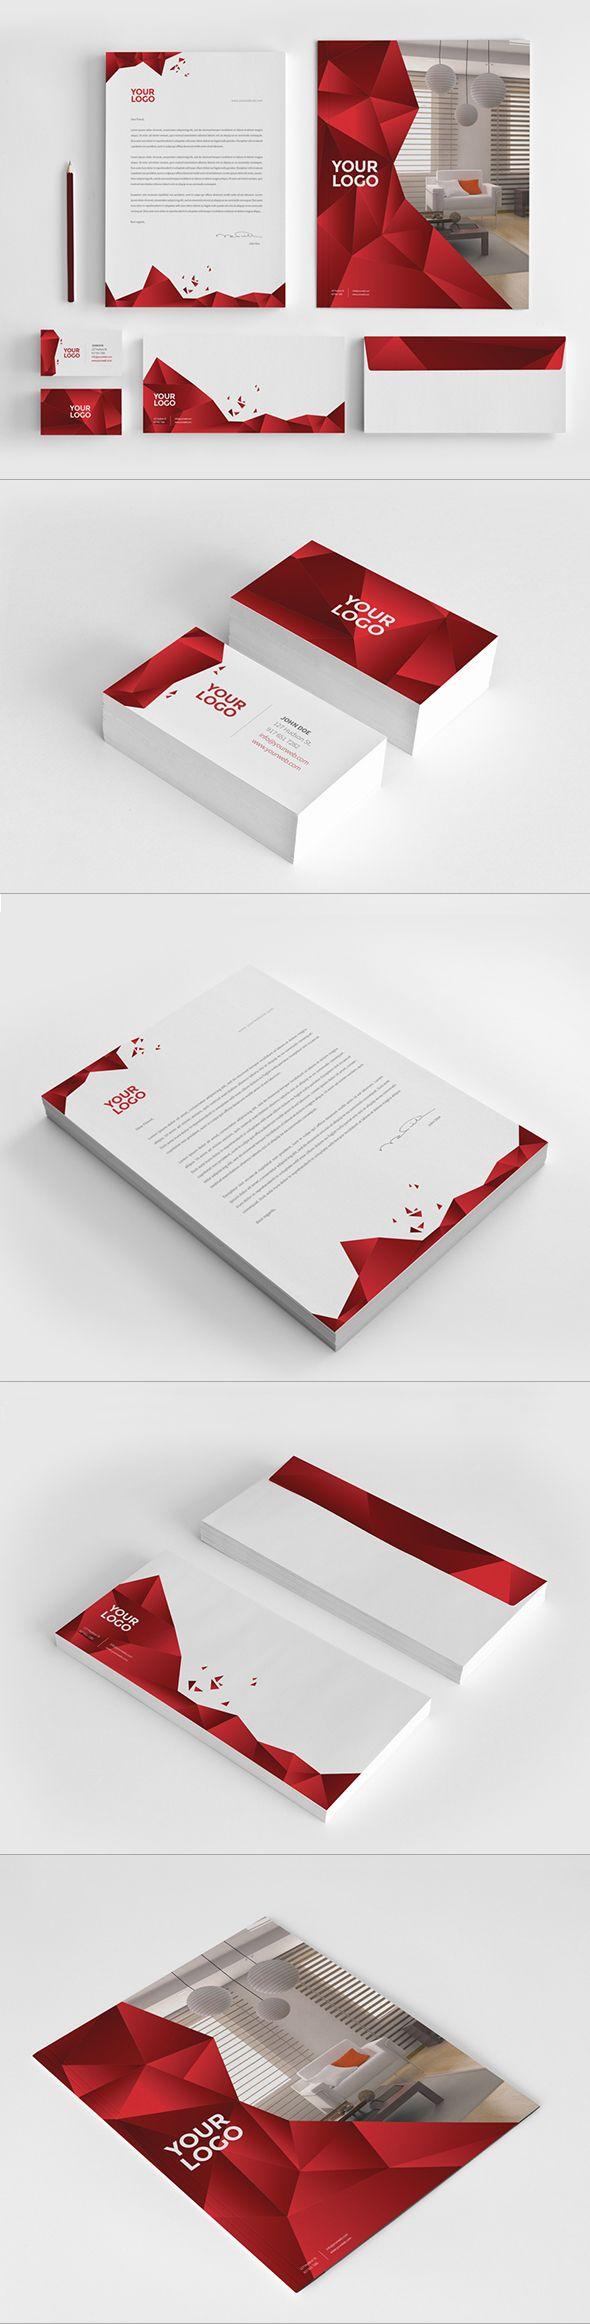 Interior Design Stationery Pack By Abra Via Behance